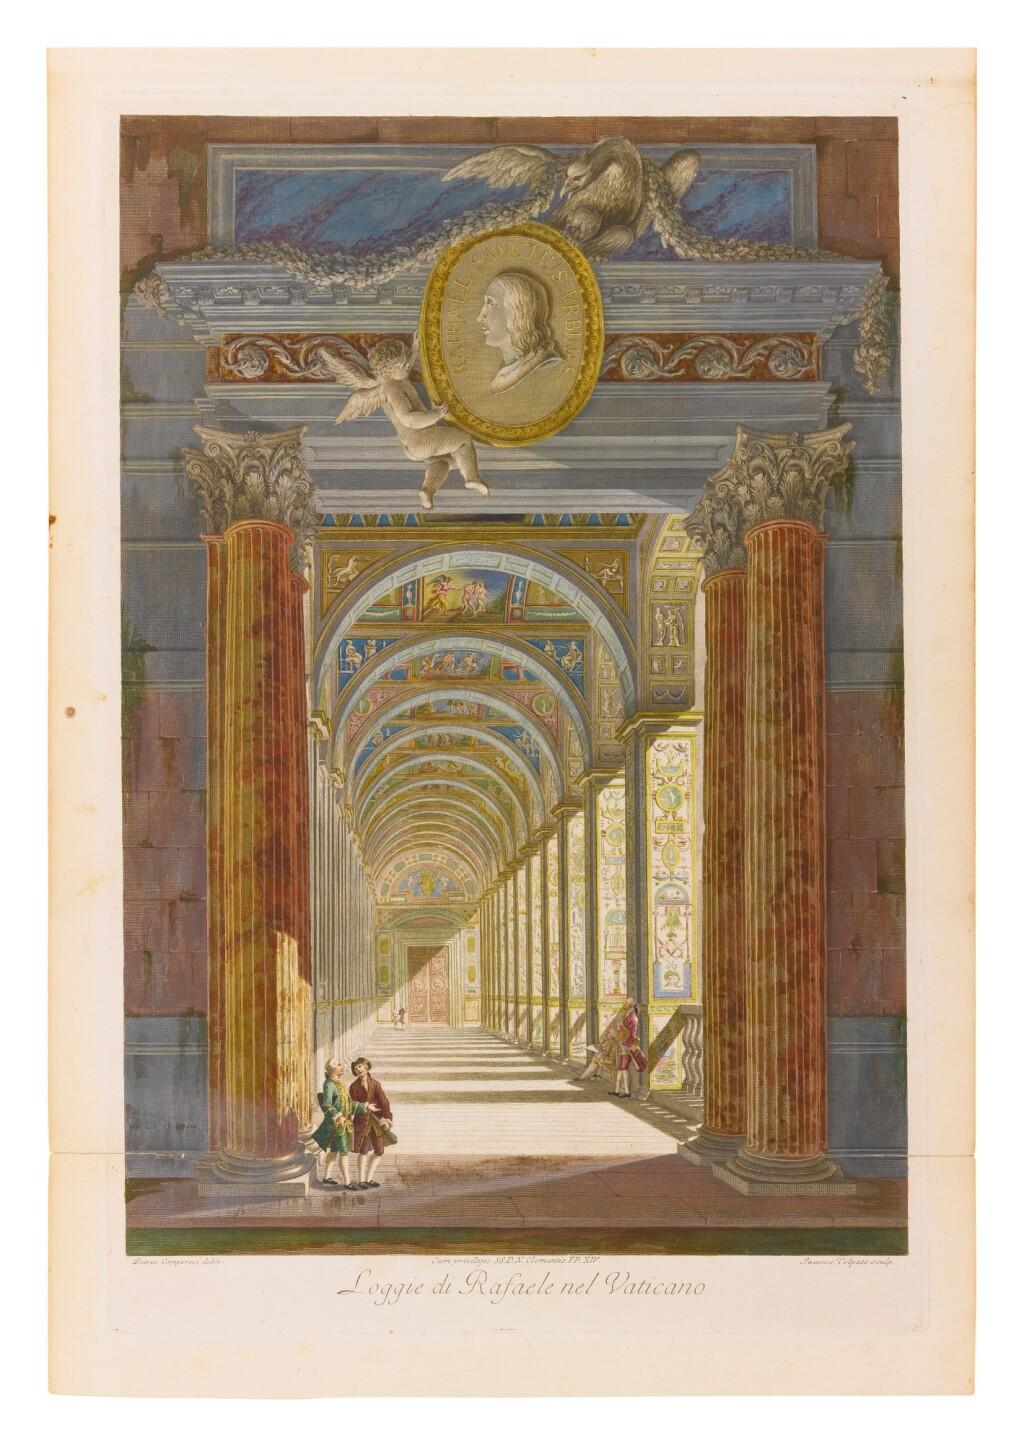 ITALIAN SCHOOL, 18TH CENTURY (AFTER SAVLORELLI & CAMPORESI, ETCHED BY OTTAVIANI)   RAPHAEL SANZIO D'URBINO, LOGGIE DE RAFAELE NEL VATICANO: A GROUP OF TEN